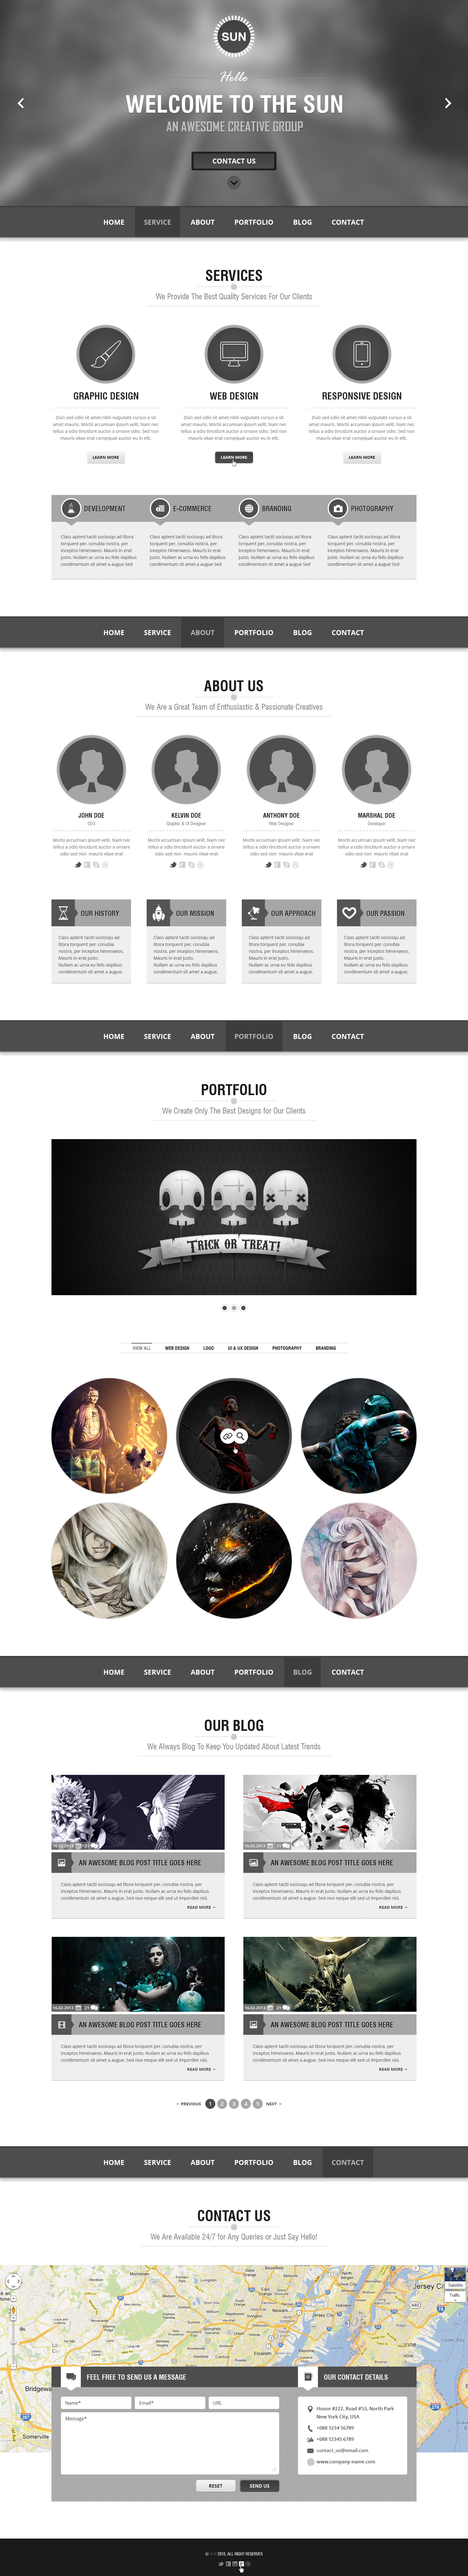 SUN - Single Page PSD Theme